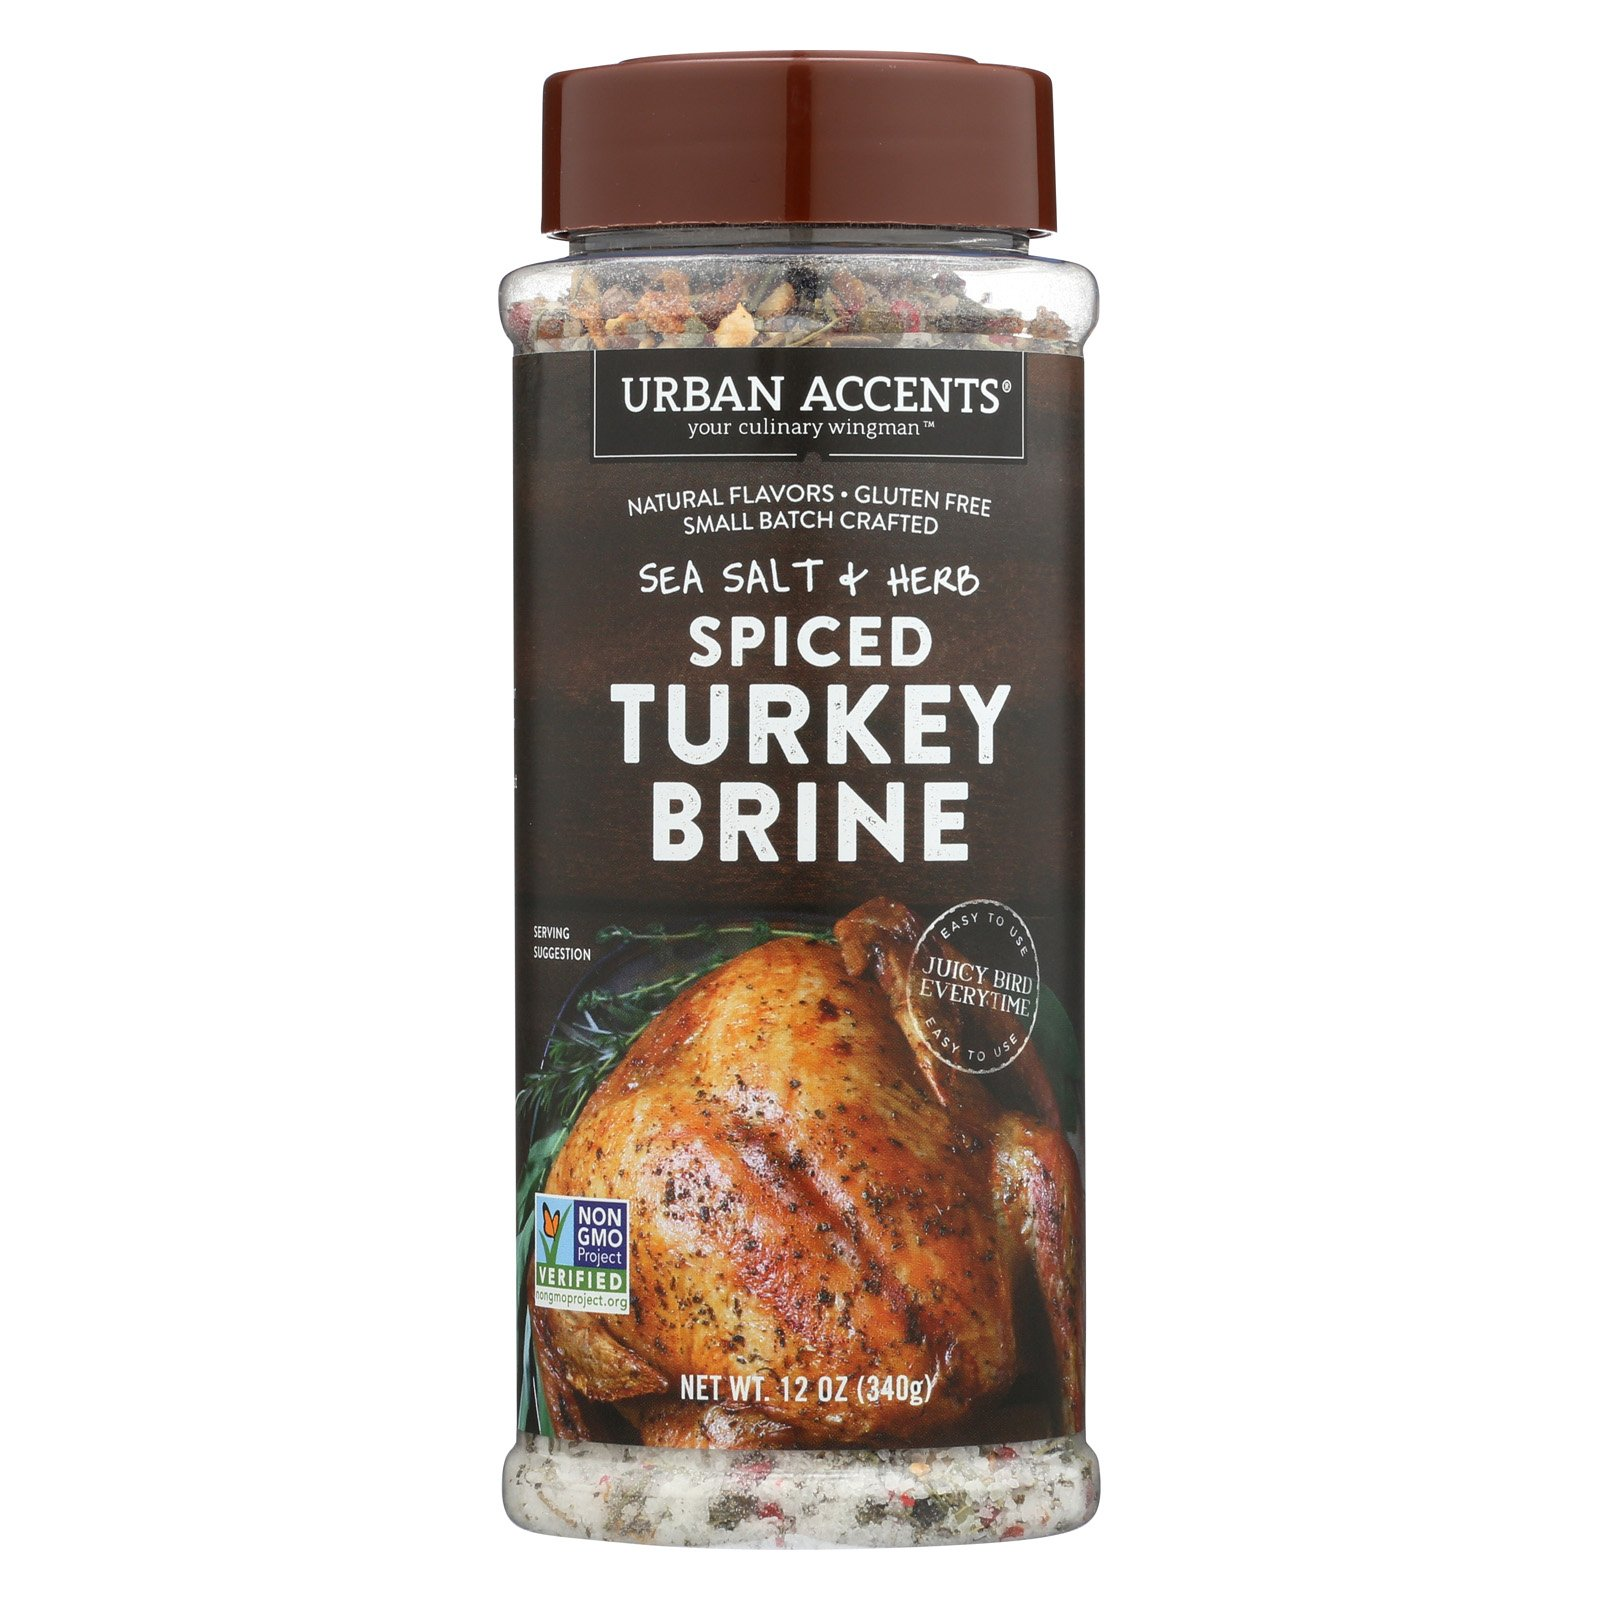 Urban Accents Spiced - Turkey Brine - Case of 6 - 12 oz.